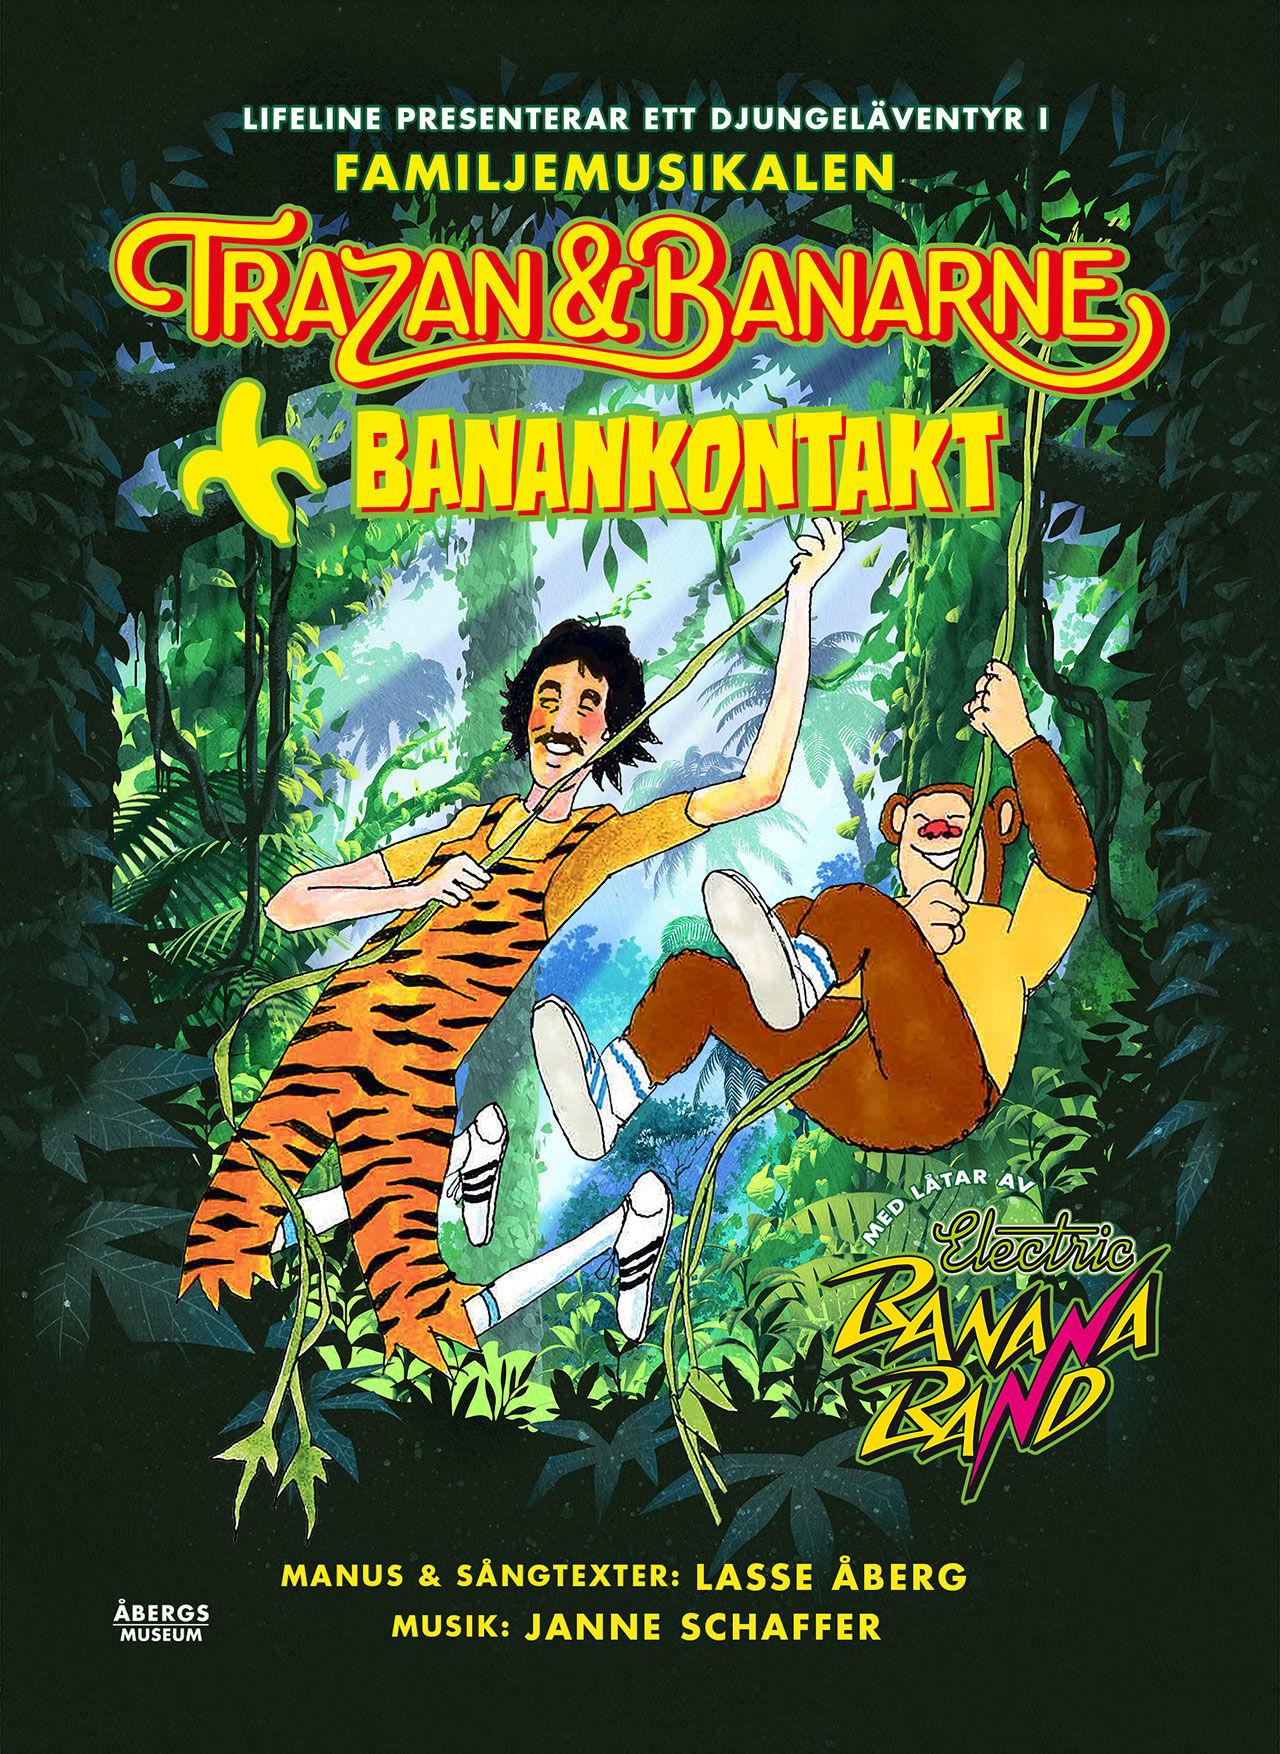 Trazan & Banarne blir familjemusikal